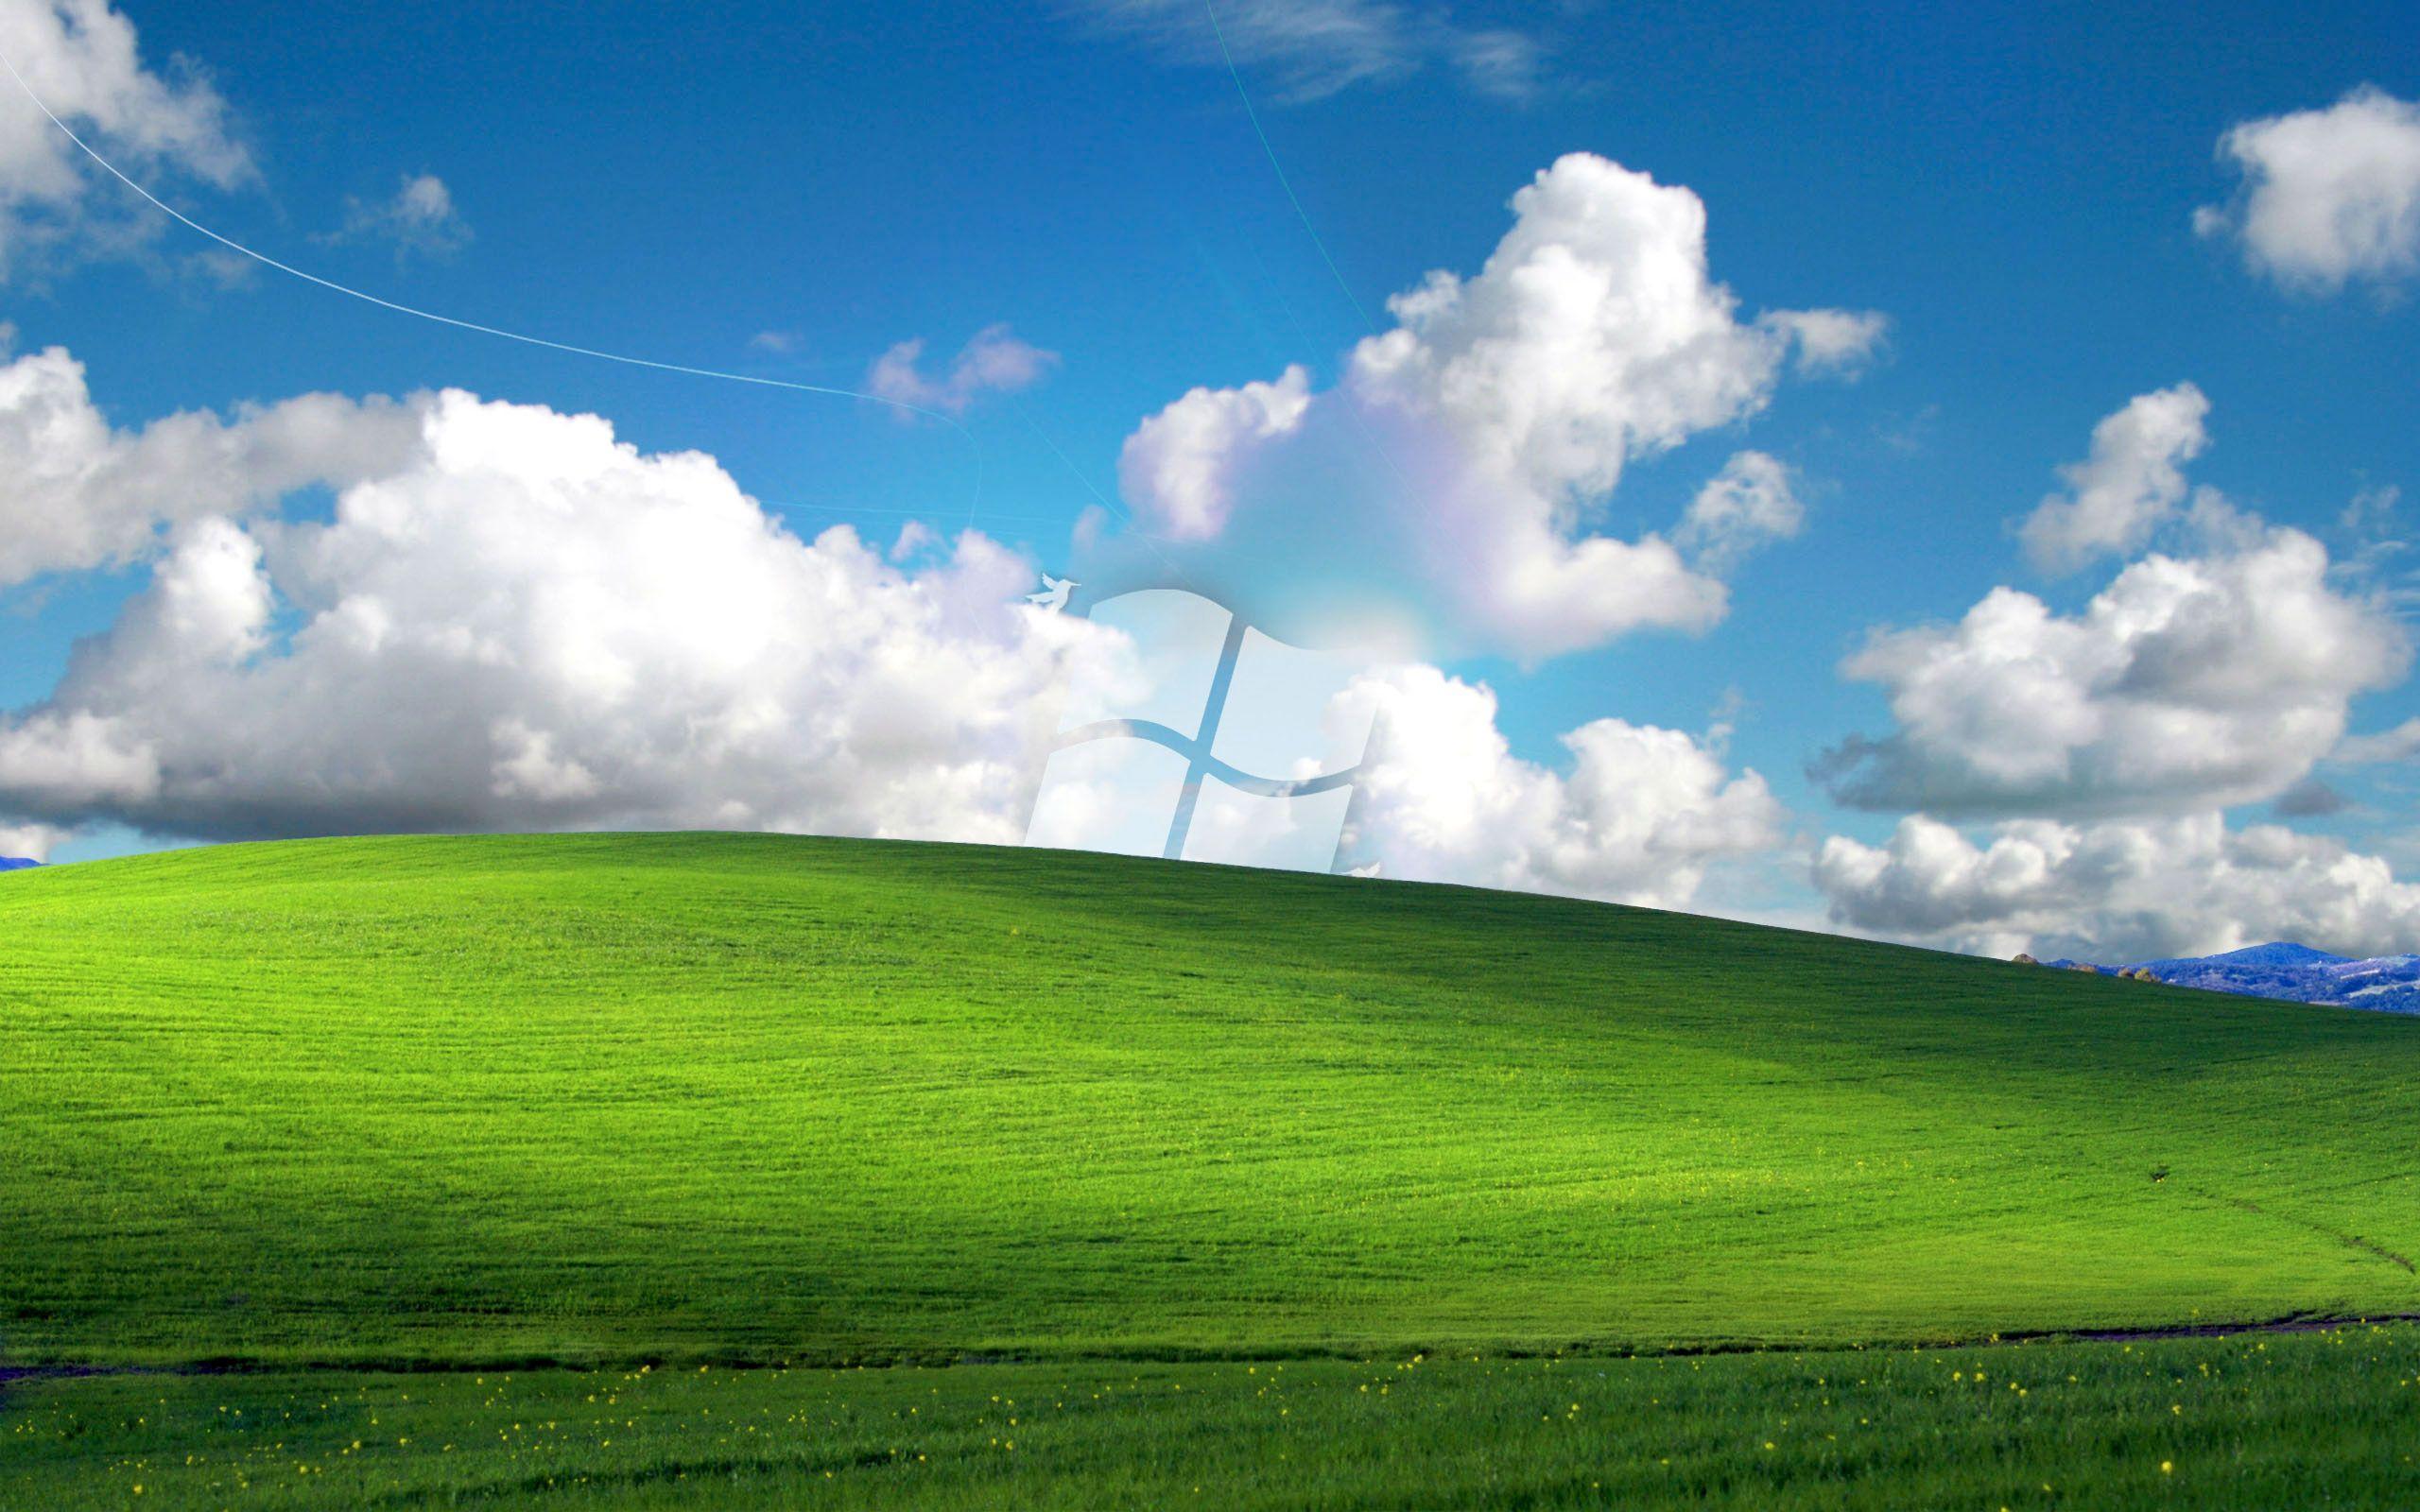 Windows photo galery download